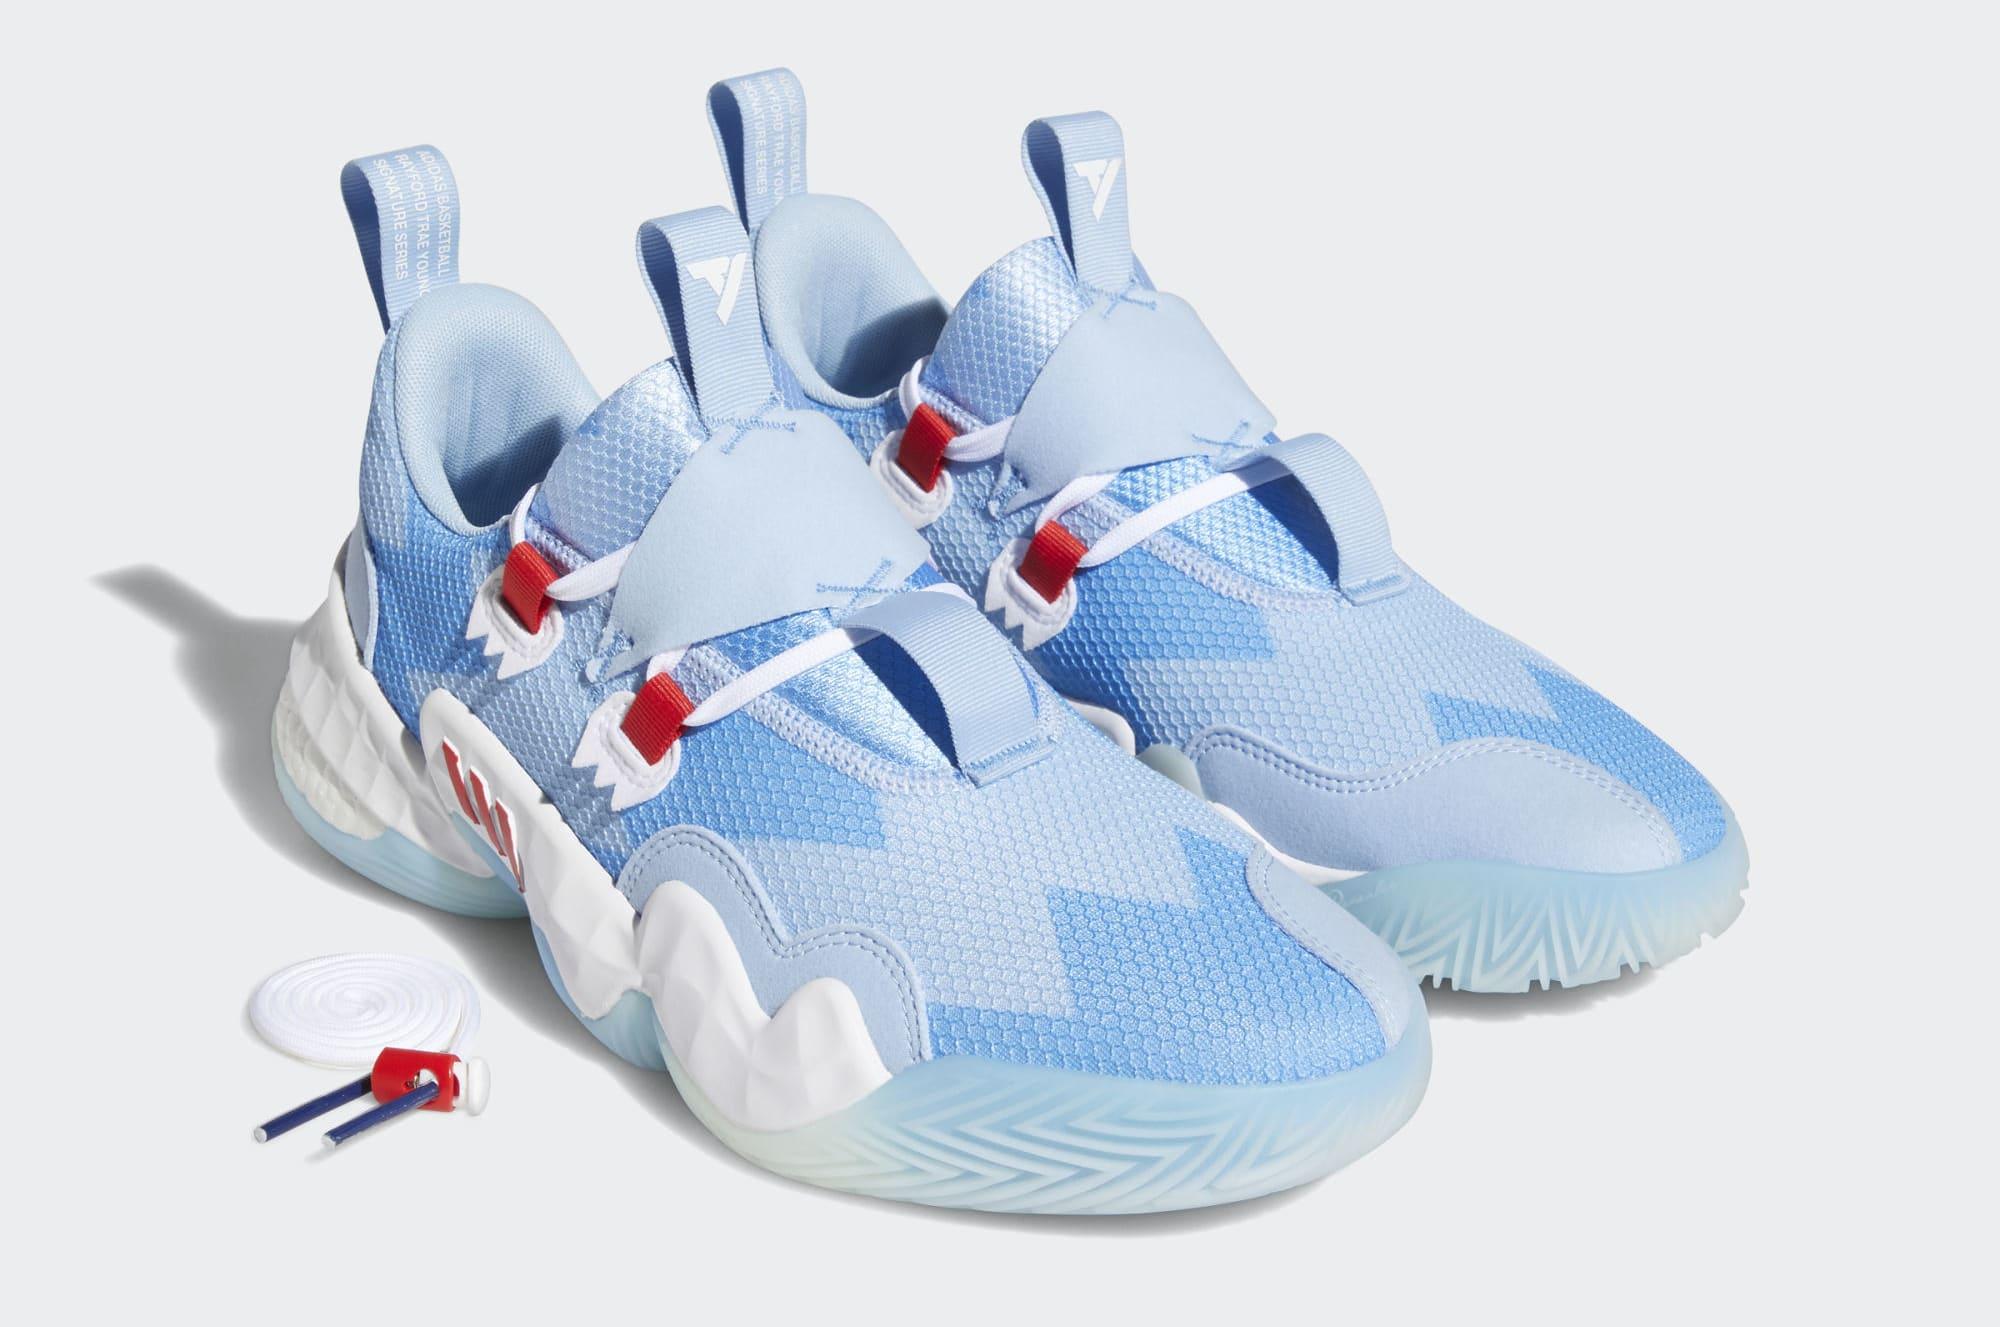 Adidas Trae Young 1 H68997 Pair